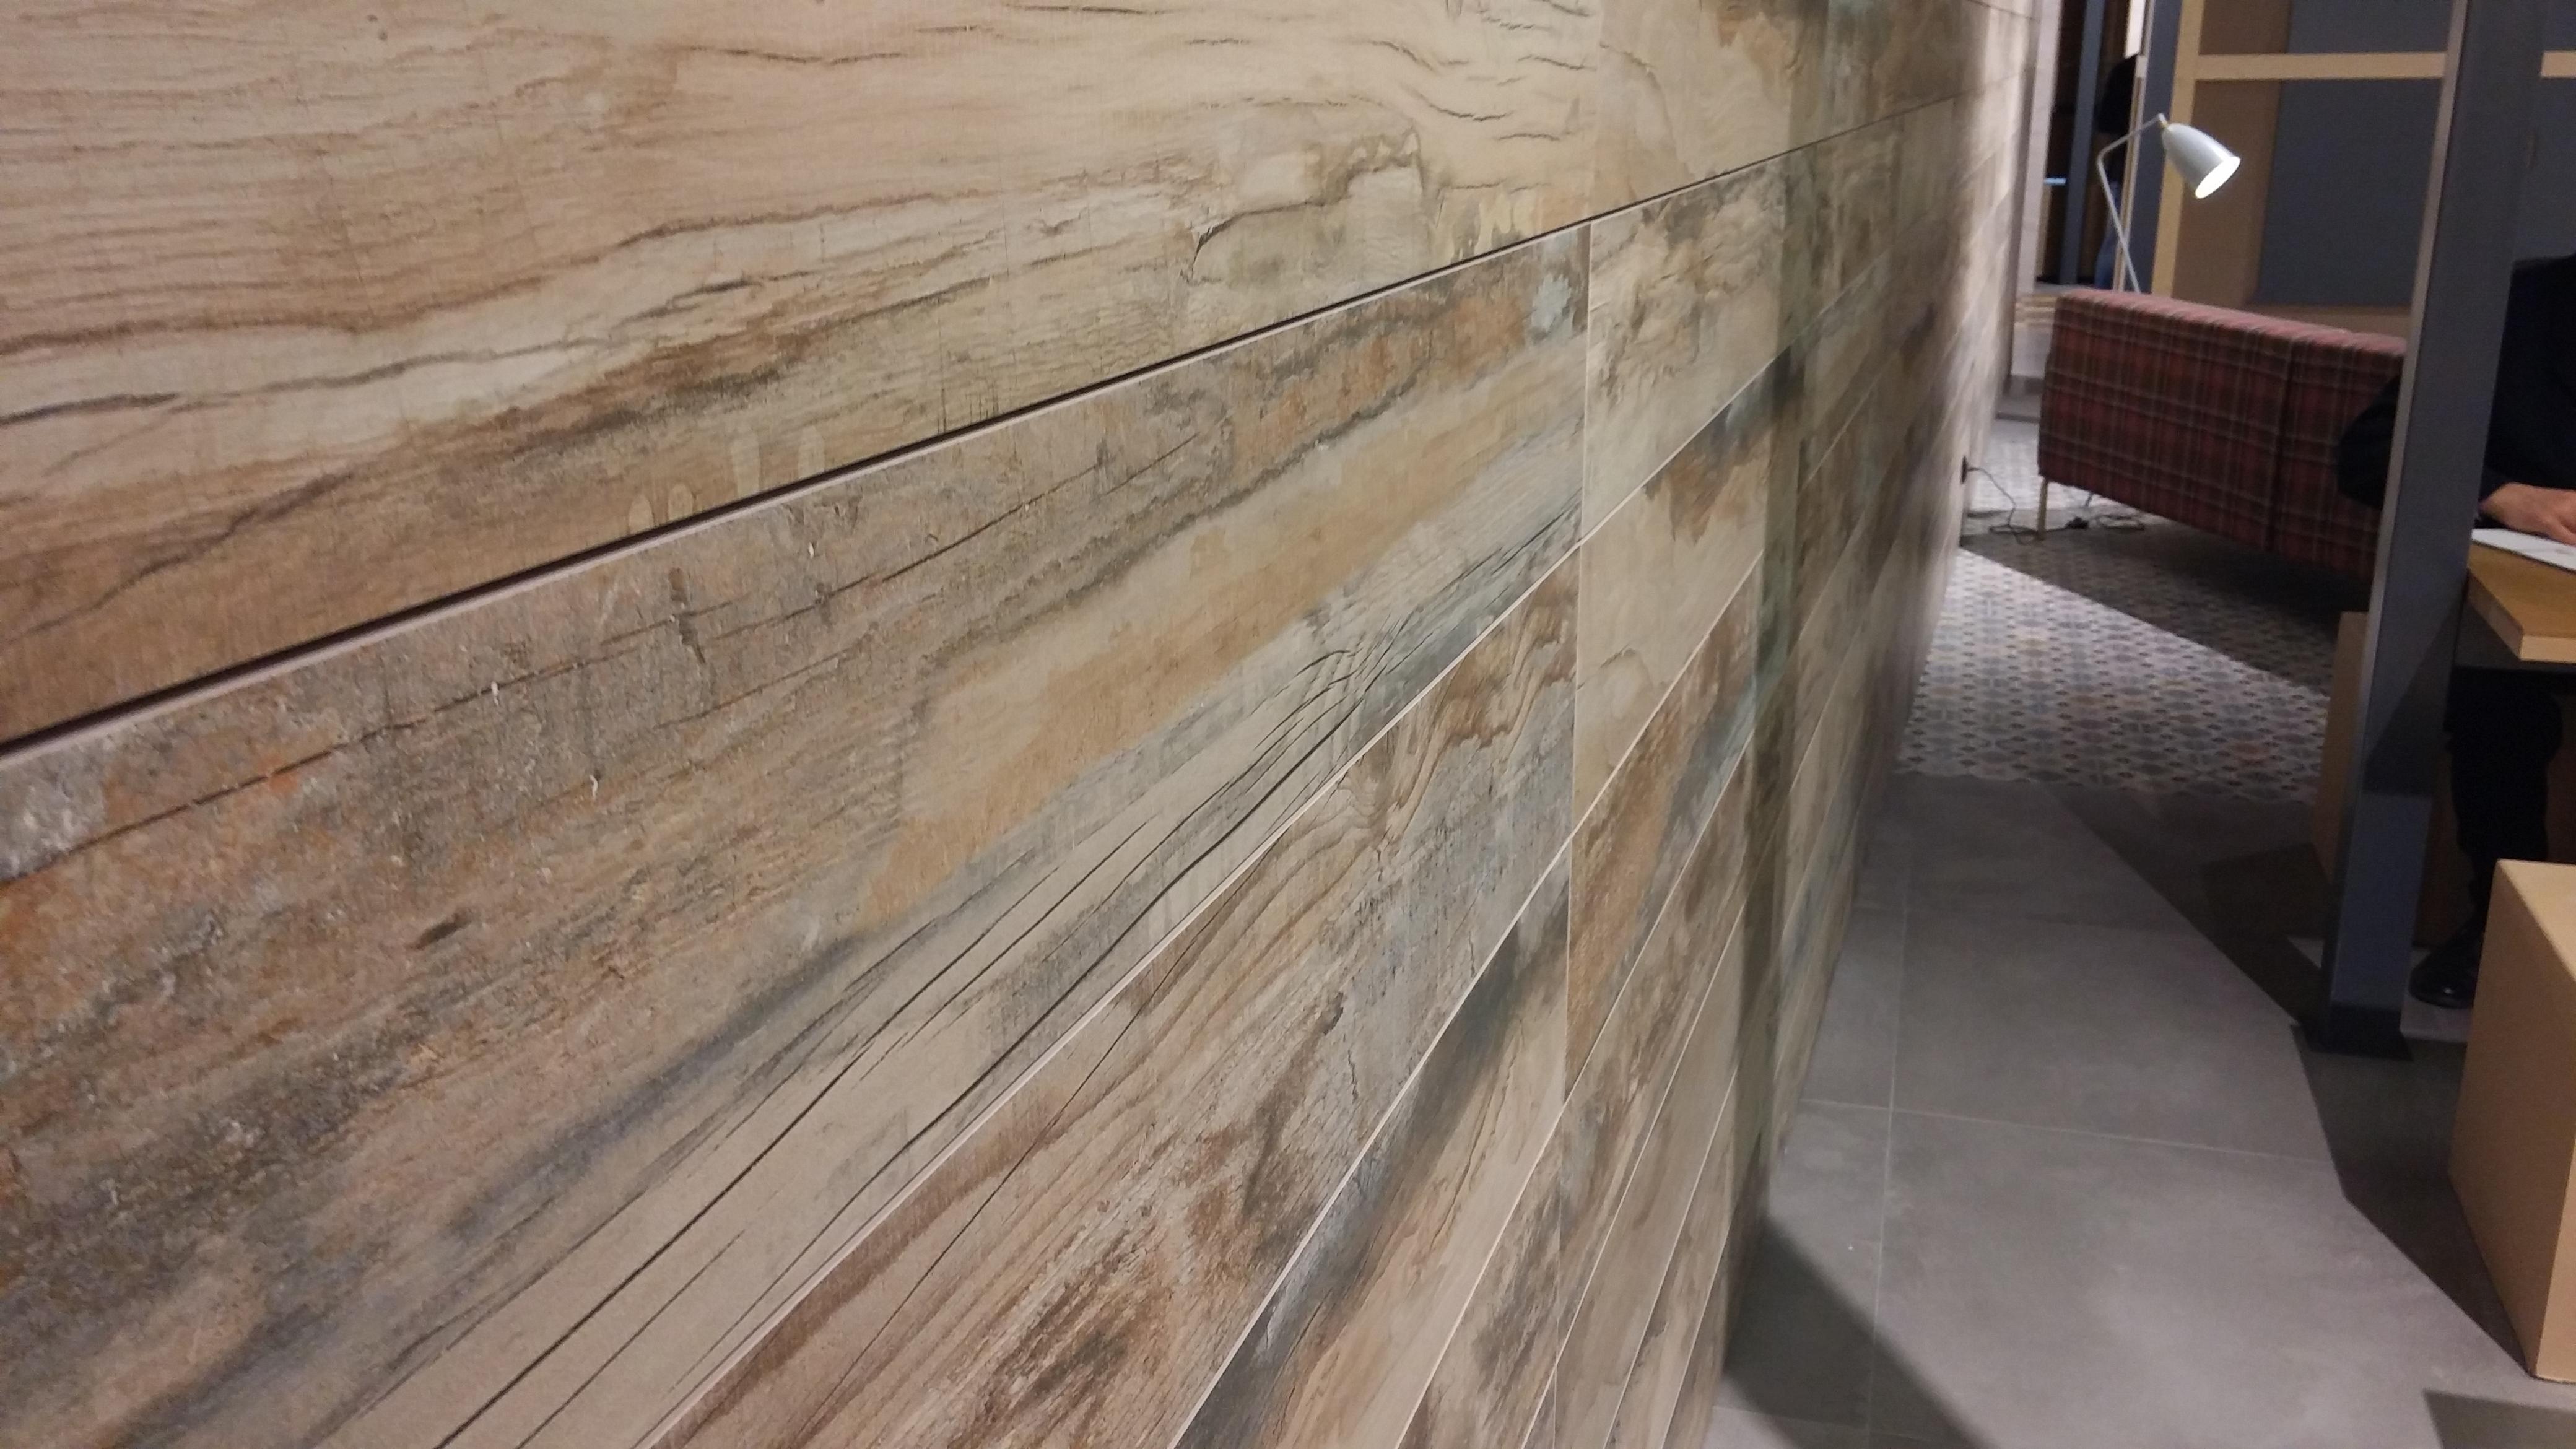 Novedades azulejos 2015 16 tino jornet - Revestimiento madera paredes ...